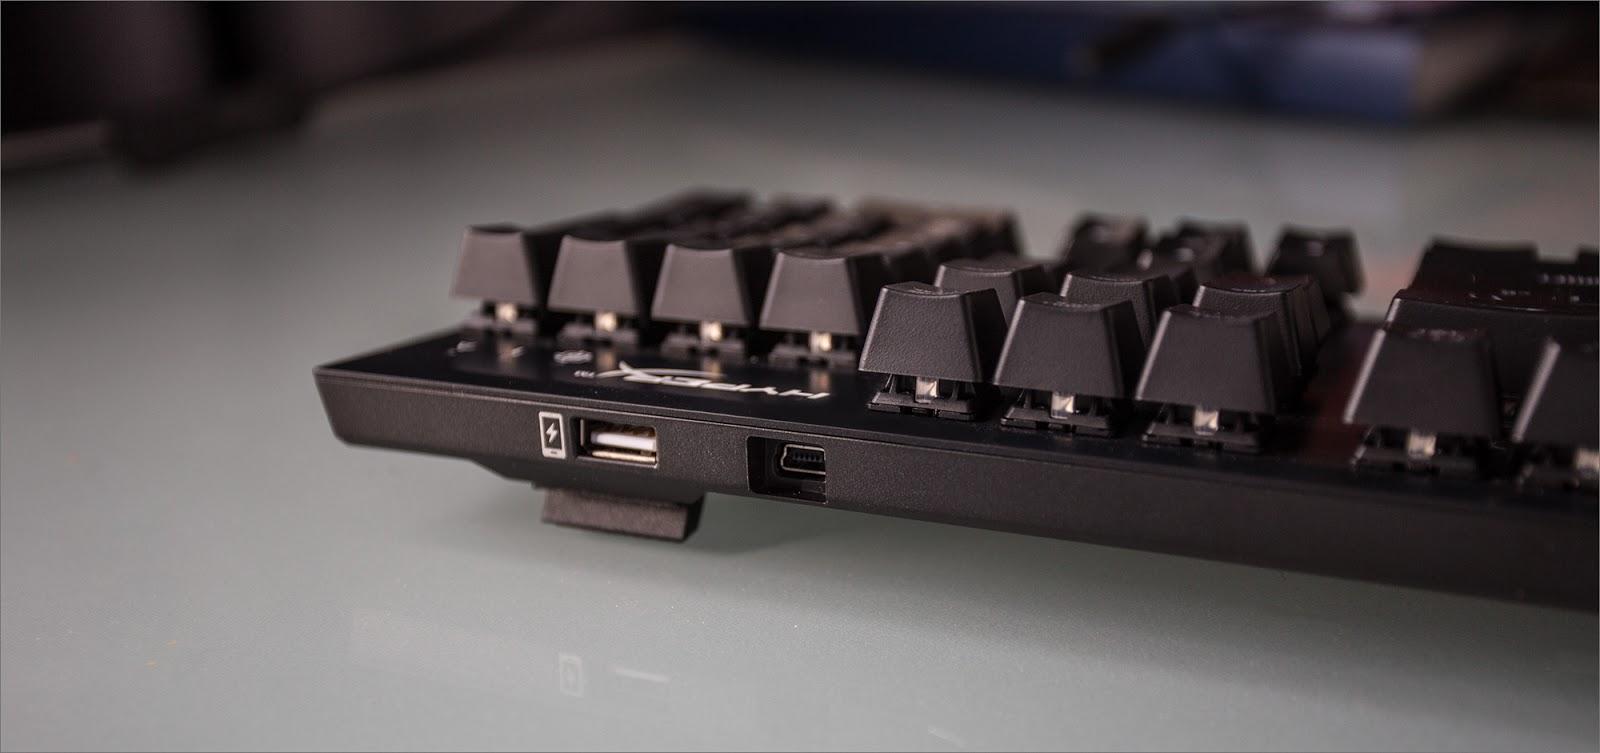 HyperX Alloy FPS — надёжность превыше всего - 3